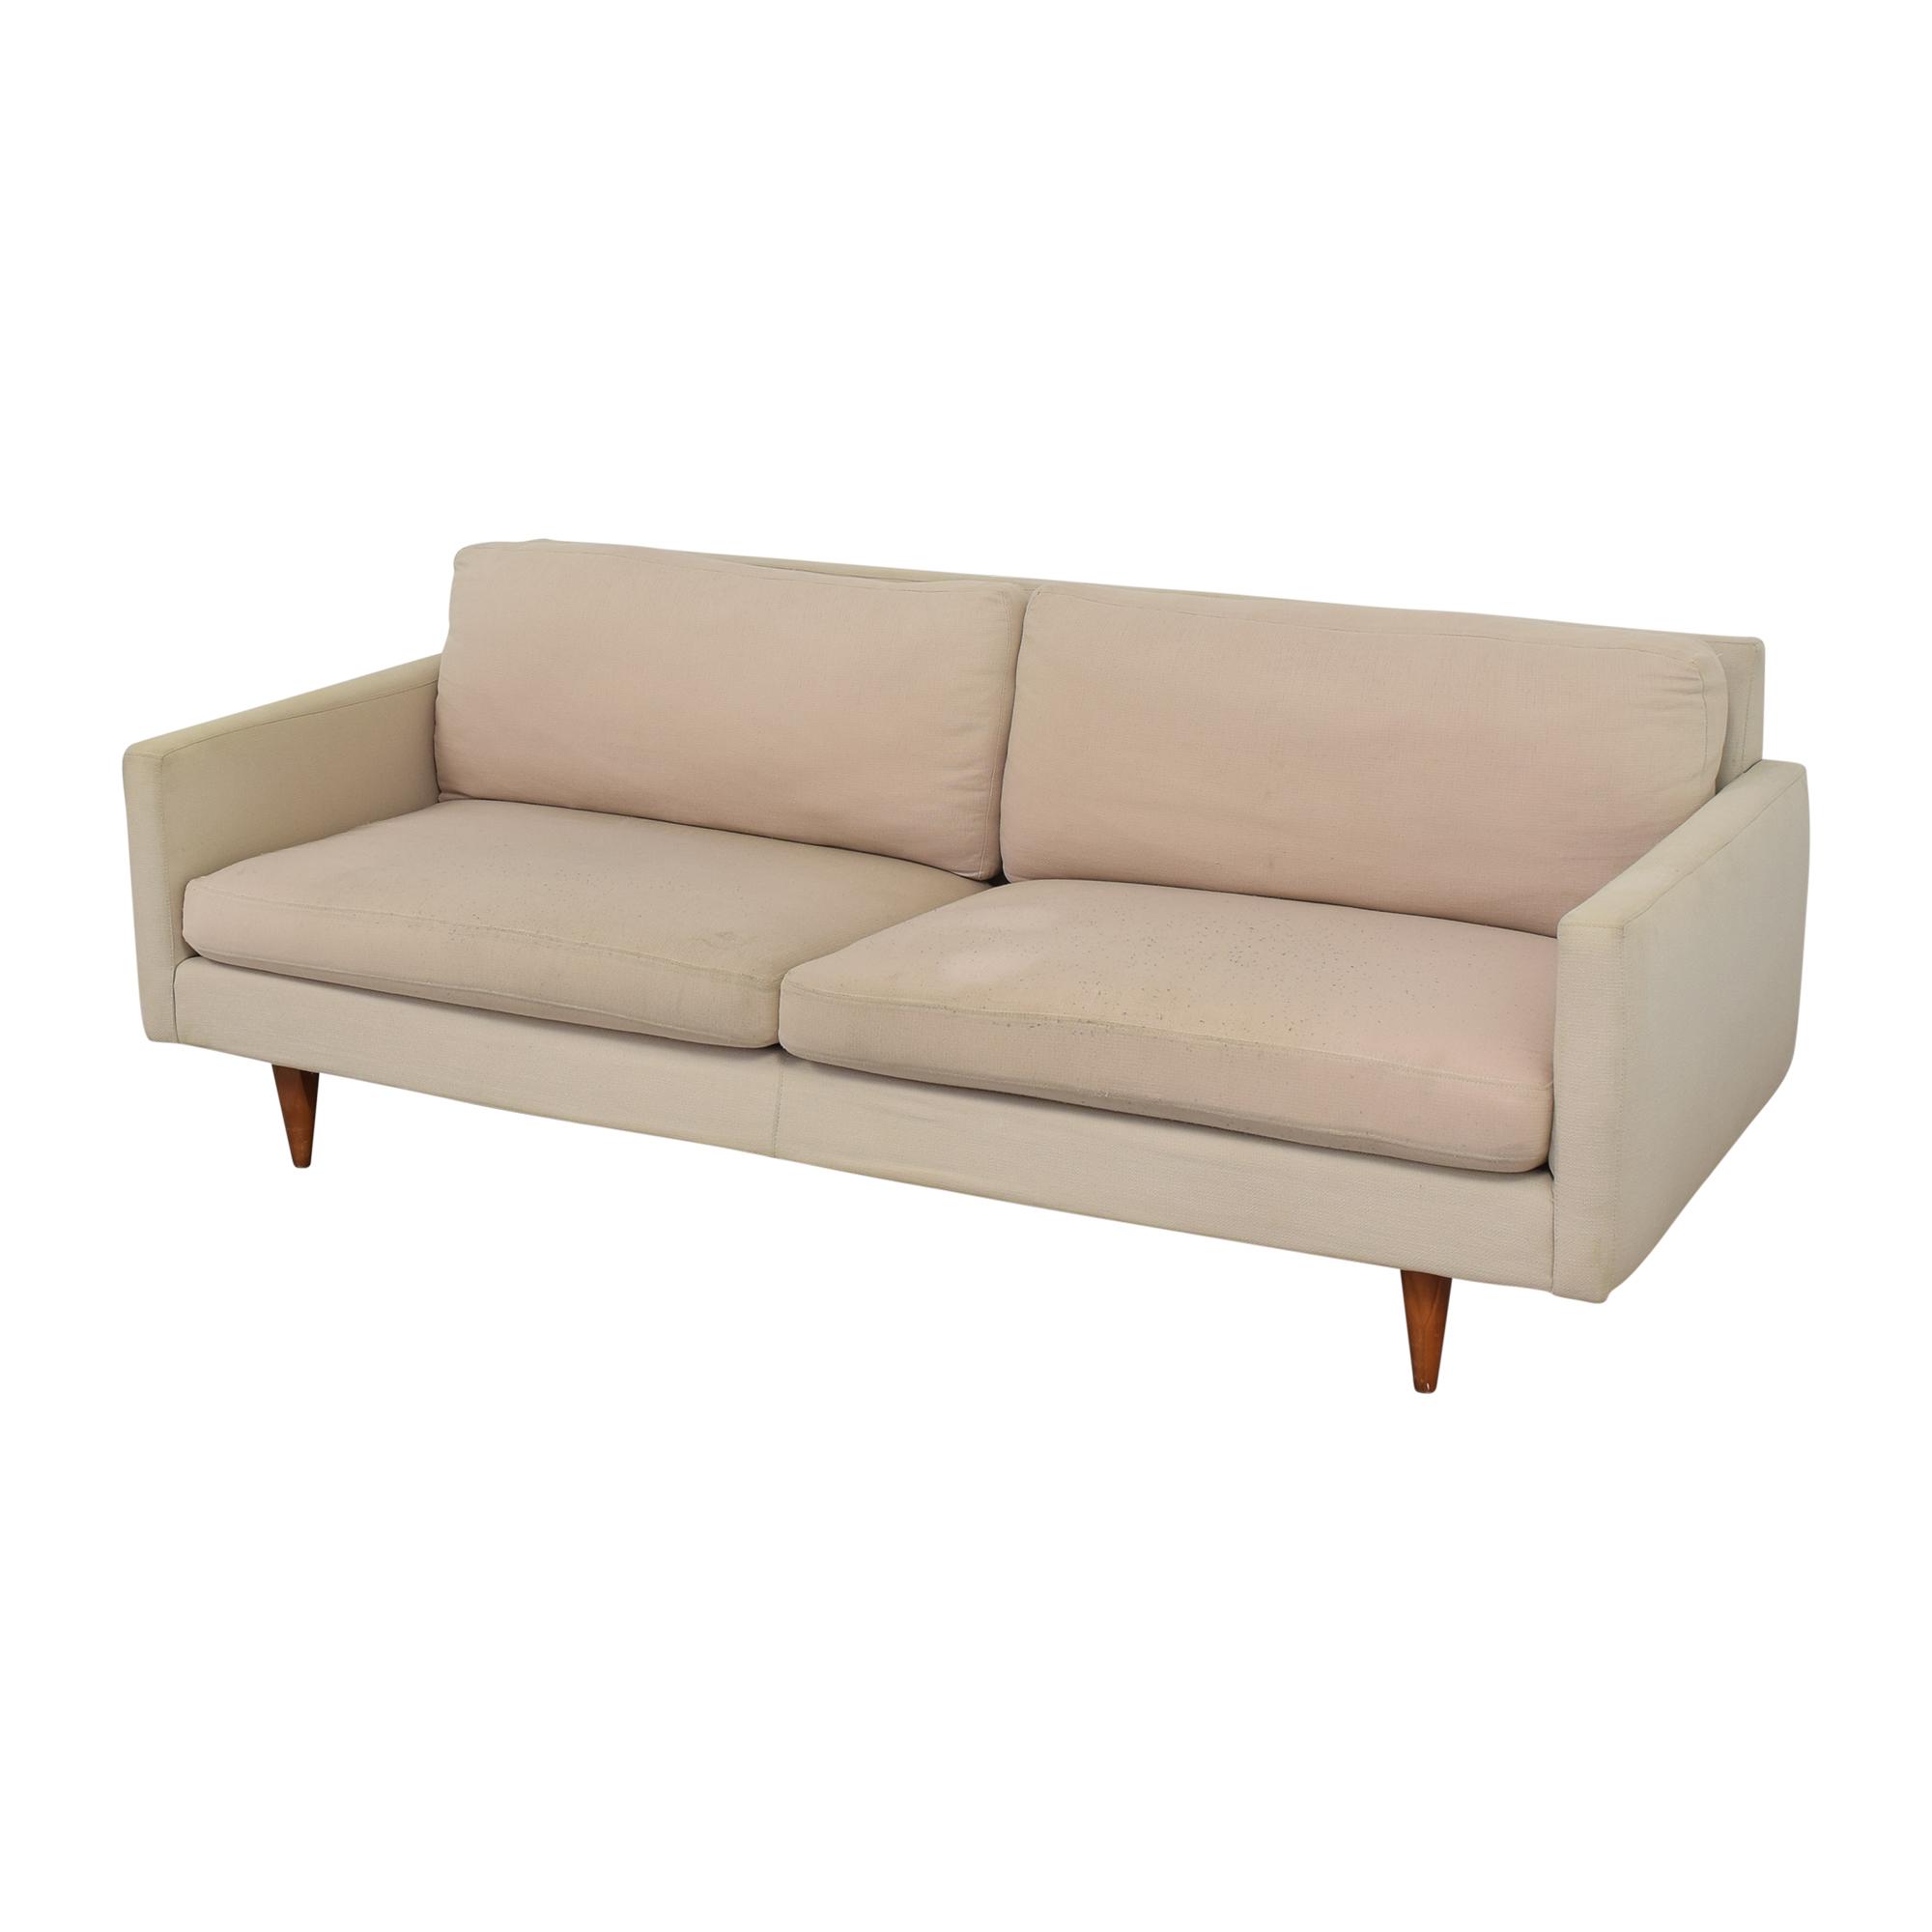 Room & Board Room & Board Jasper Mid Century Sofa beige